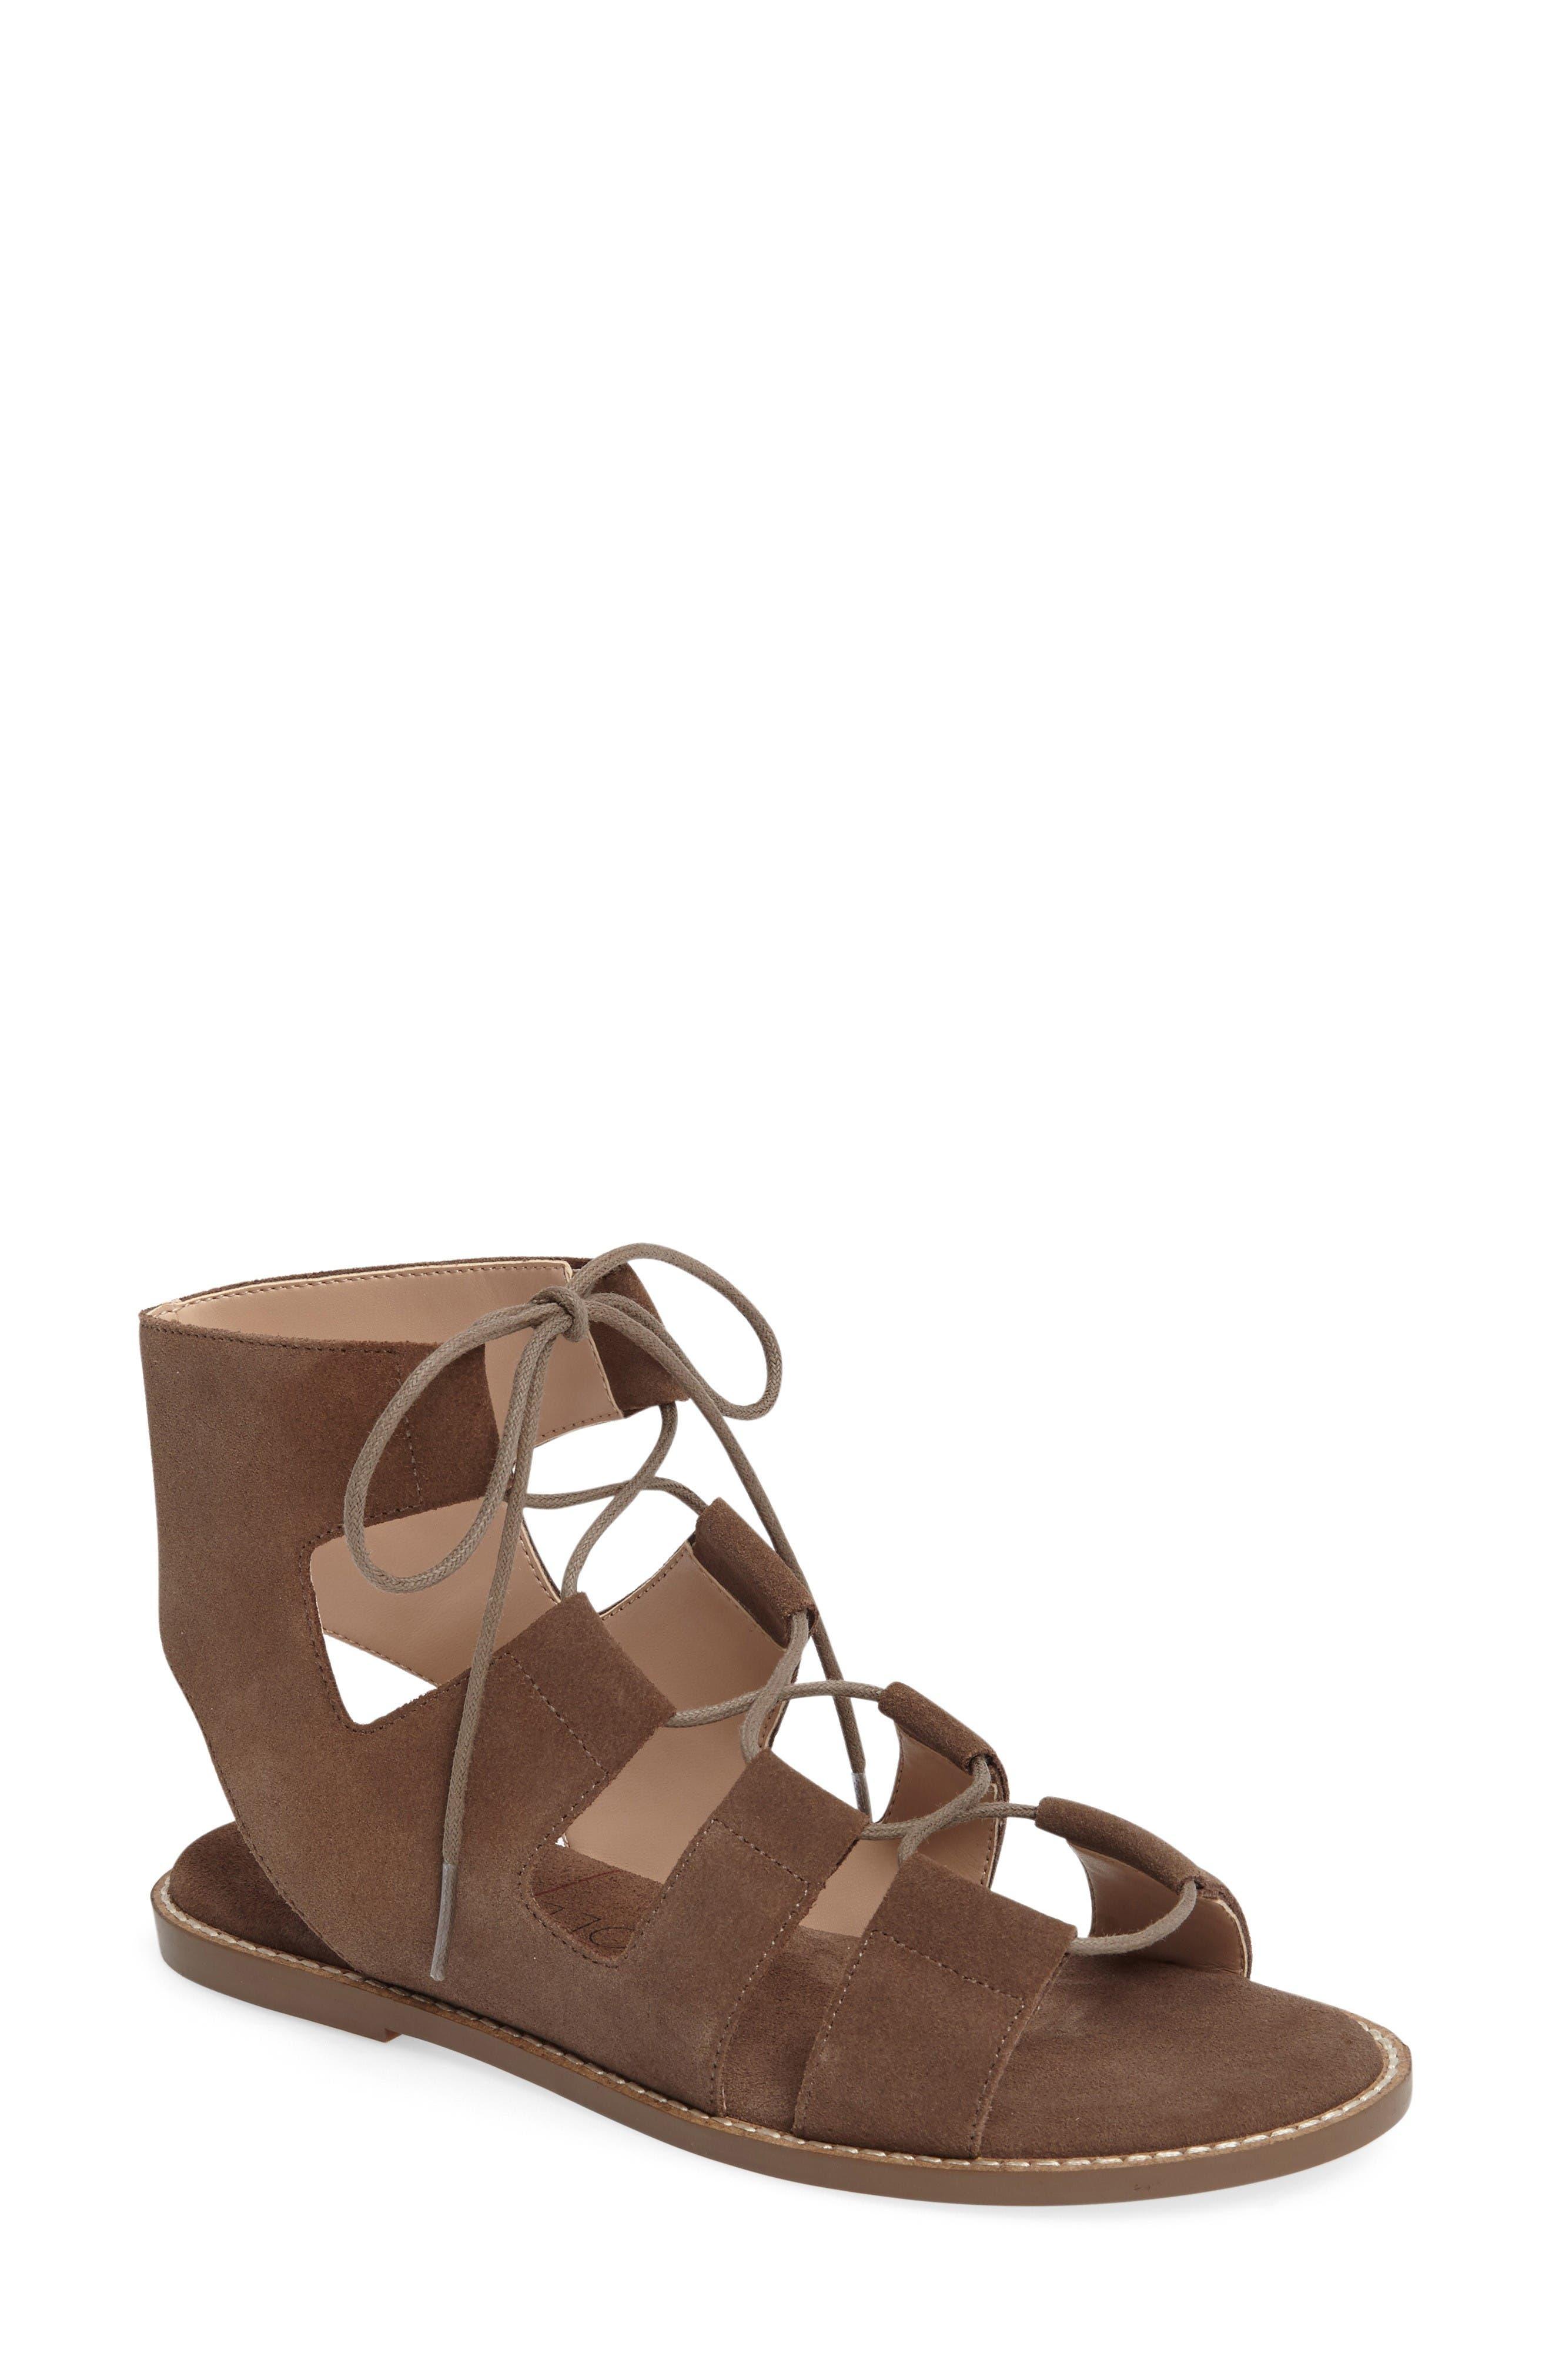 Main Image - Sole Society 'Cady' Lace-Up Flat Sandal (Women)